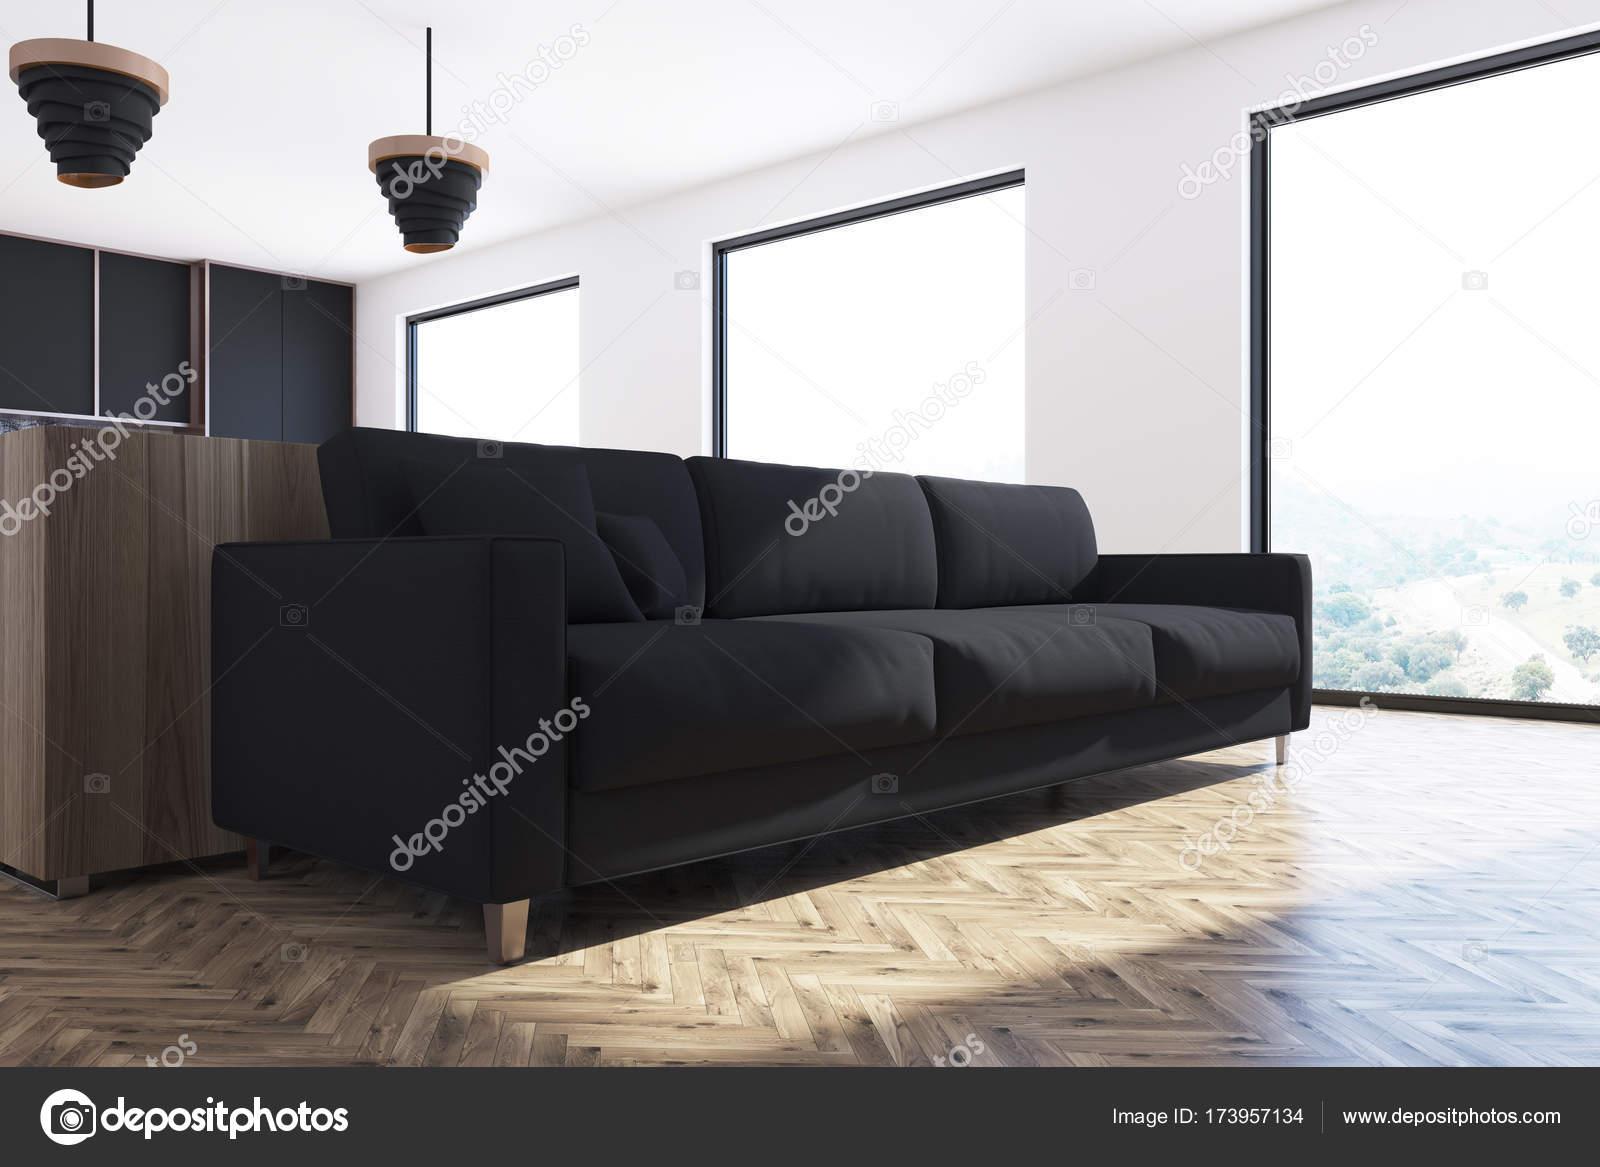 Woonkamer Zwarte Bank : Wit woonkamer met zwarte bank u stockfoto denisismagilov